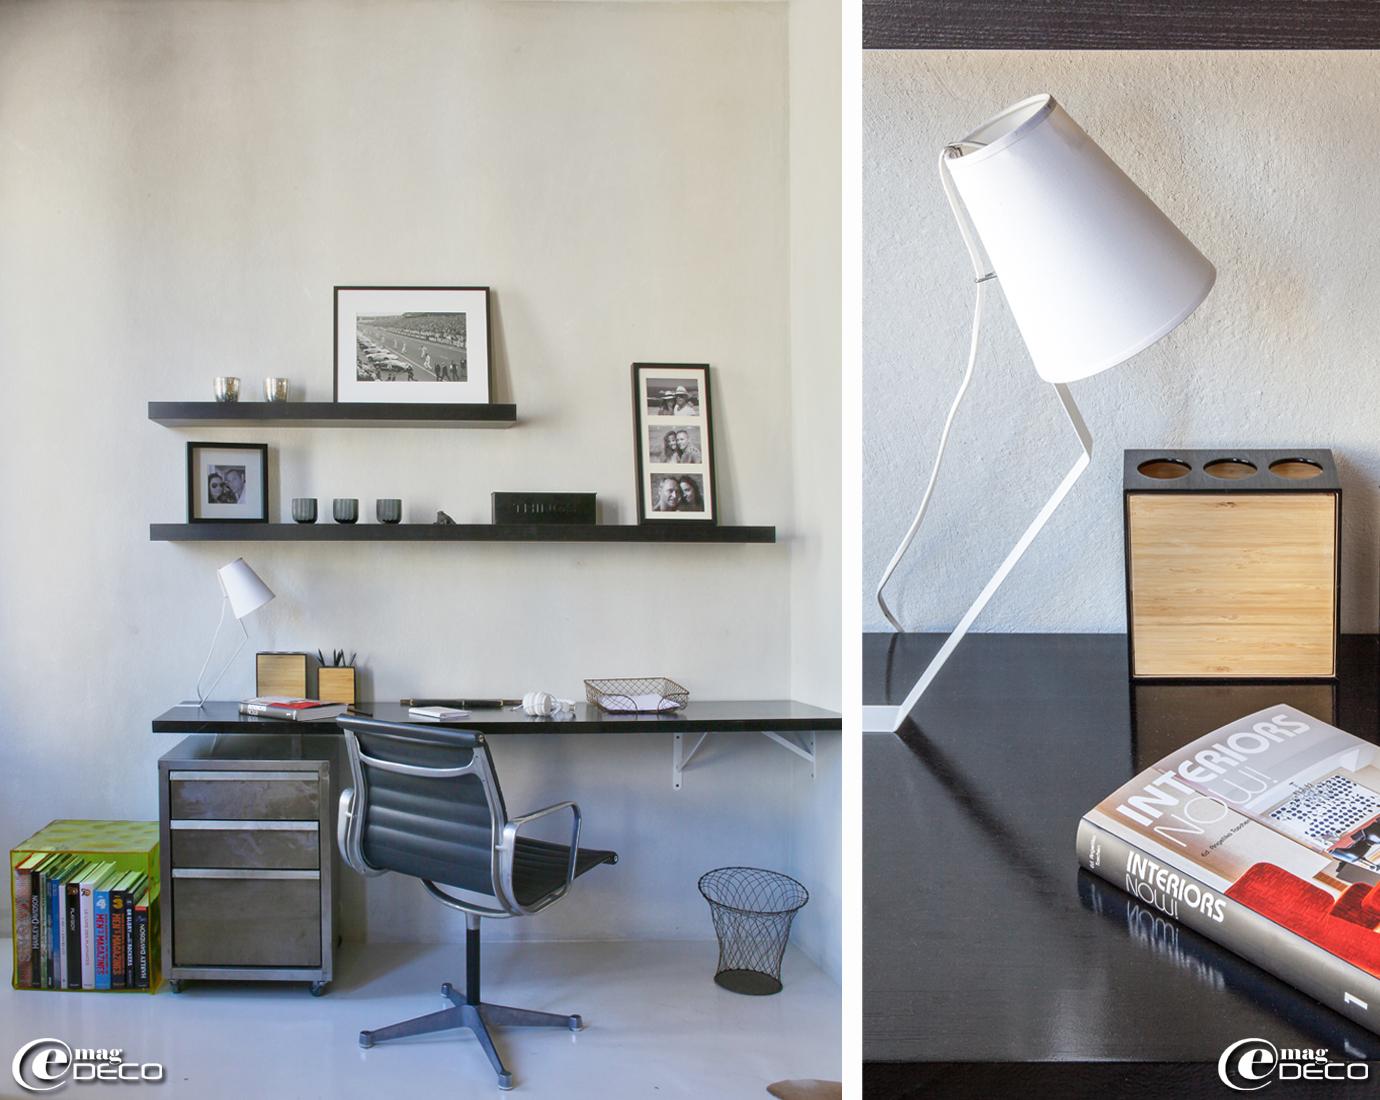 Kitea bureau chaise de bureau ikea chaise de cuisine gl chaise